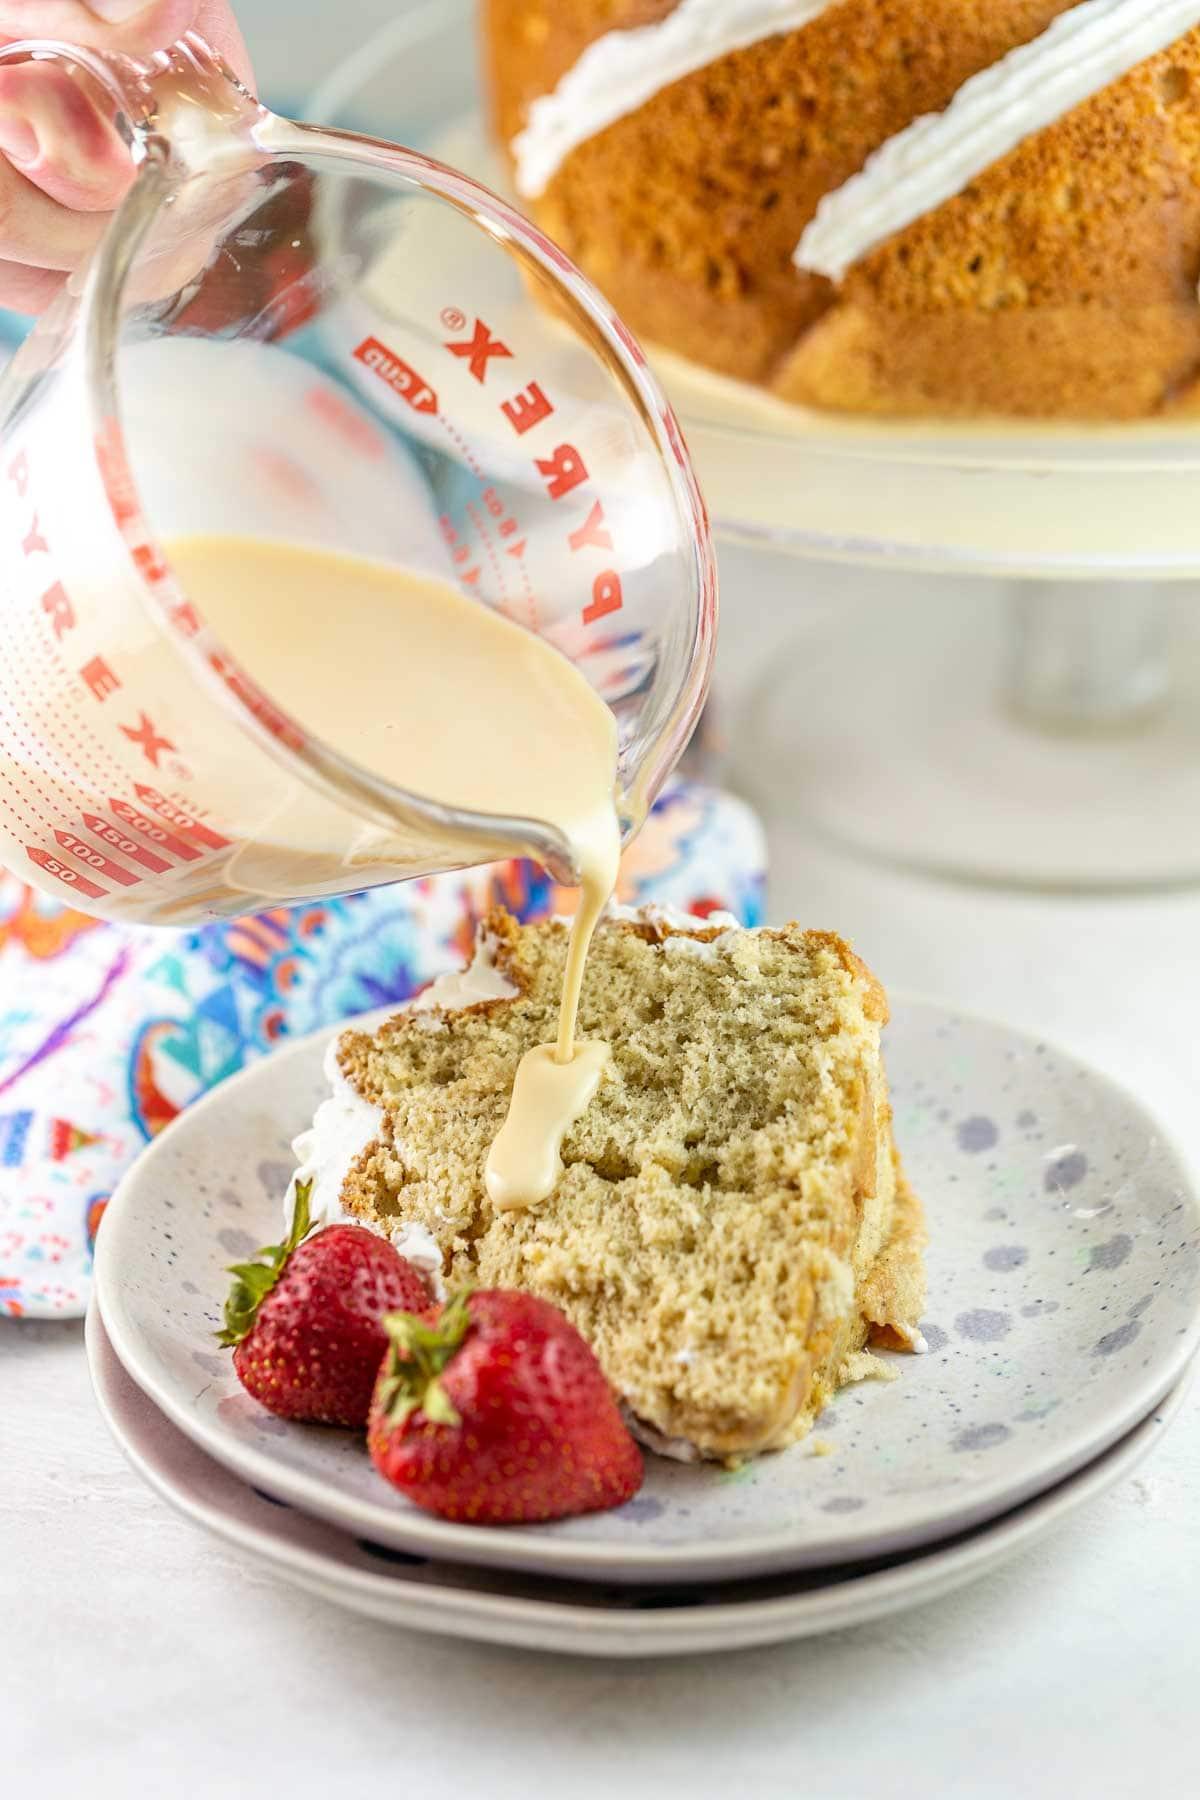 pouring extra milk mixture onto a slice of bundt cake